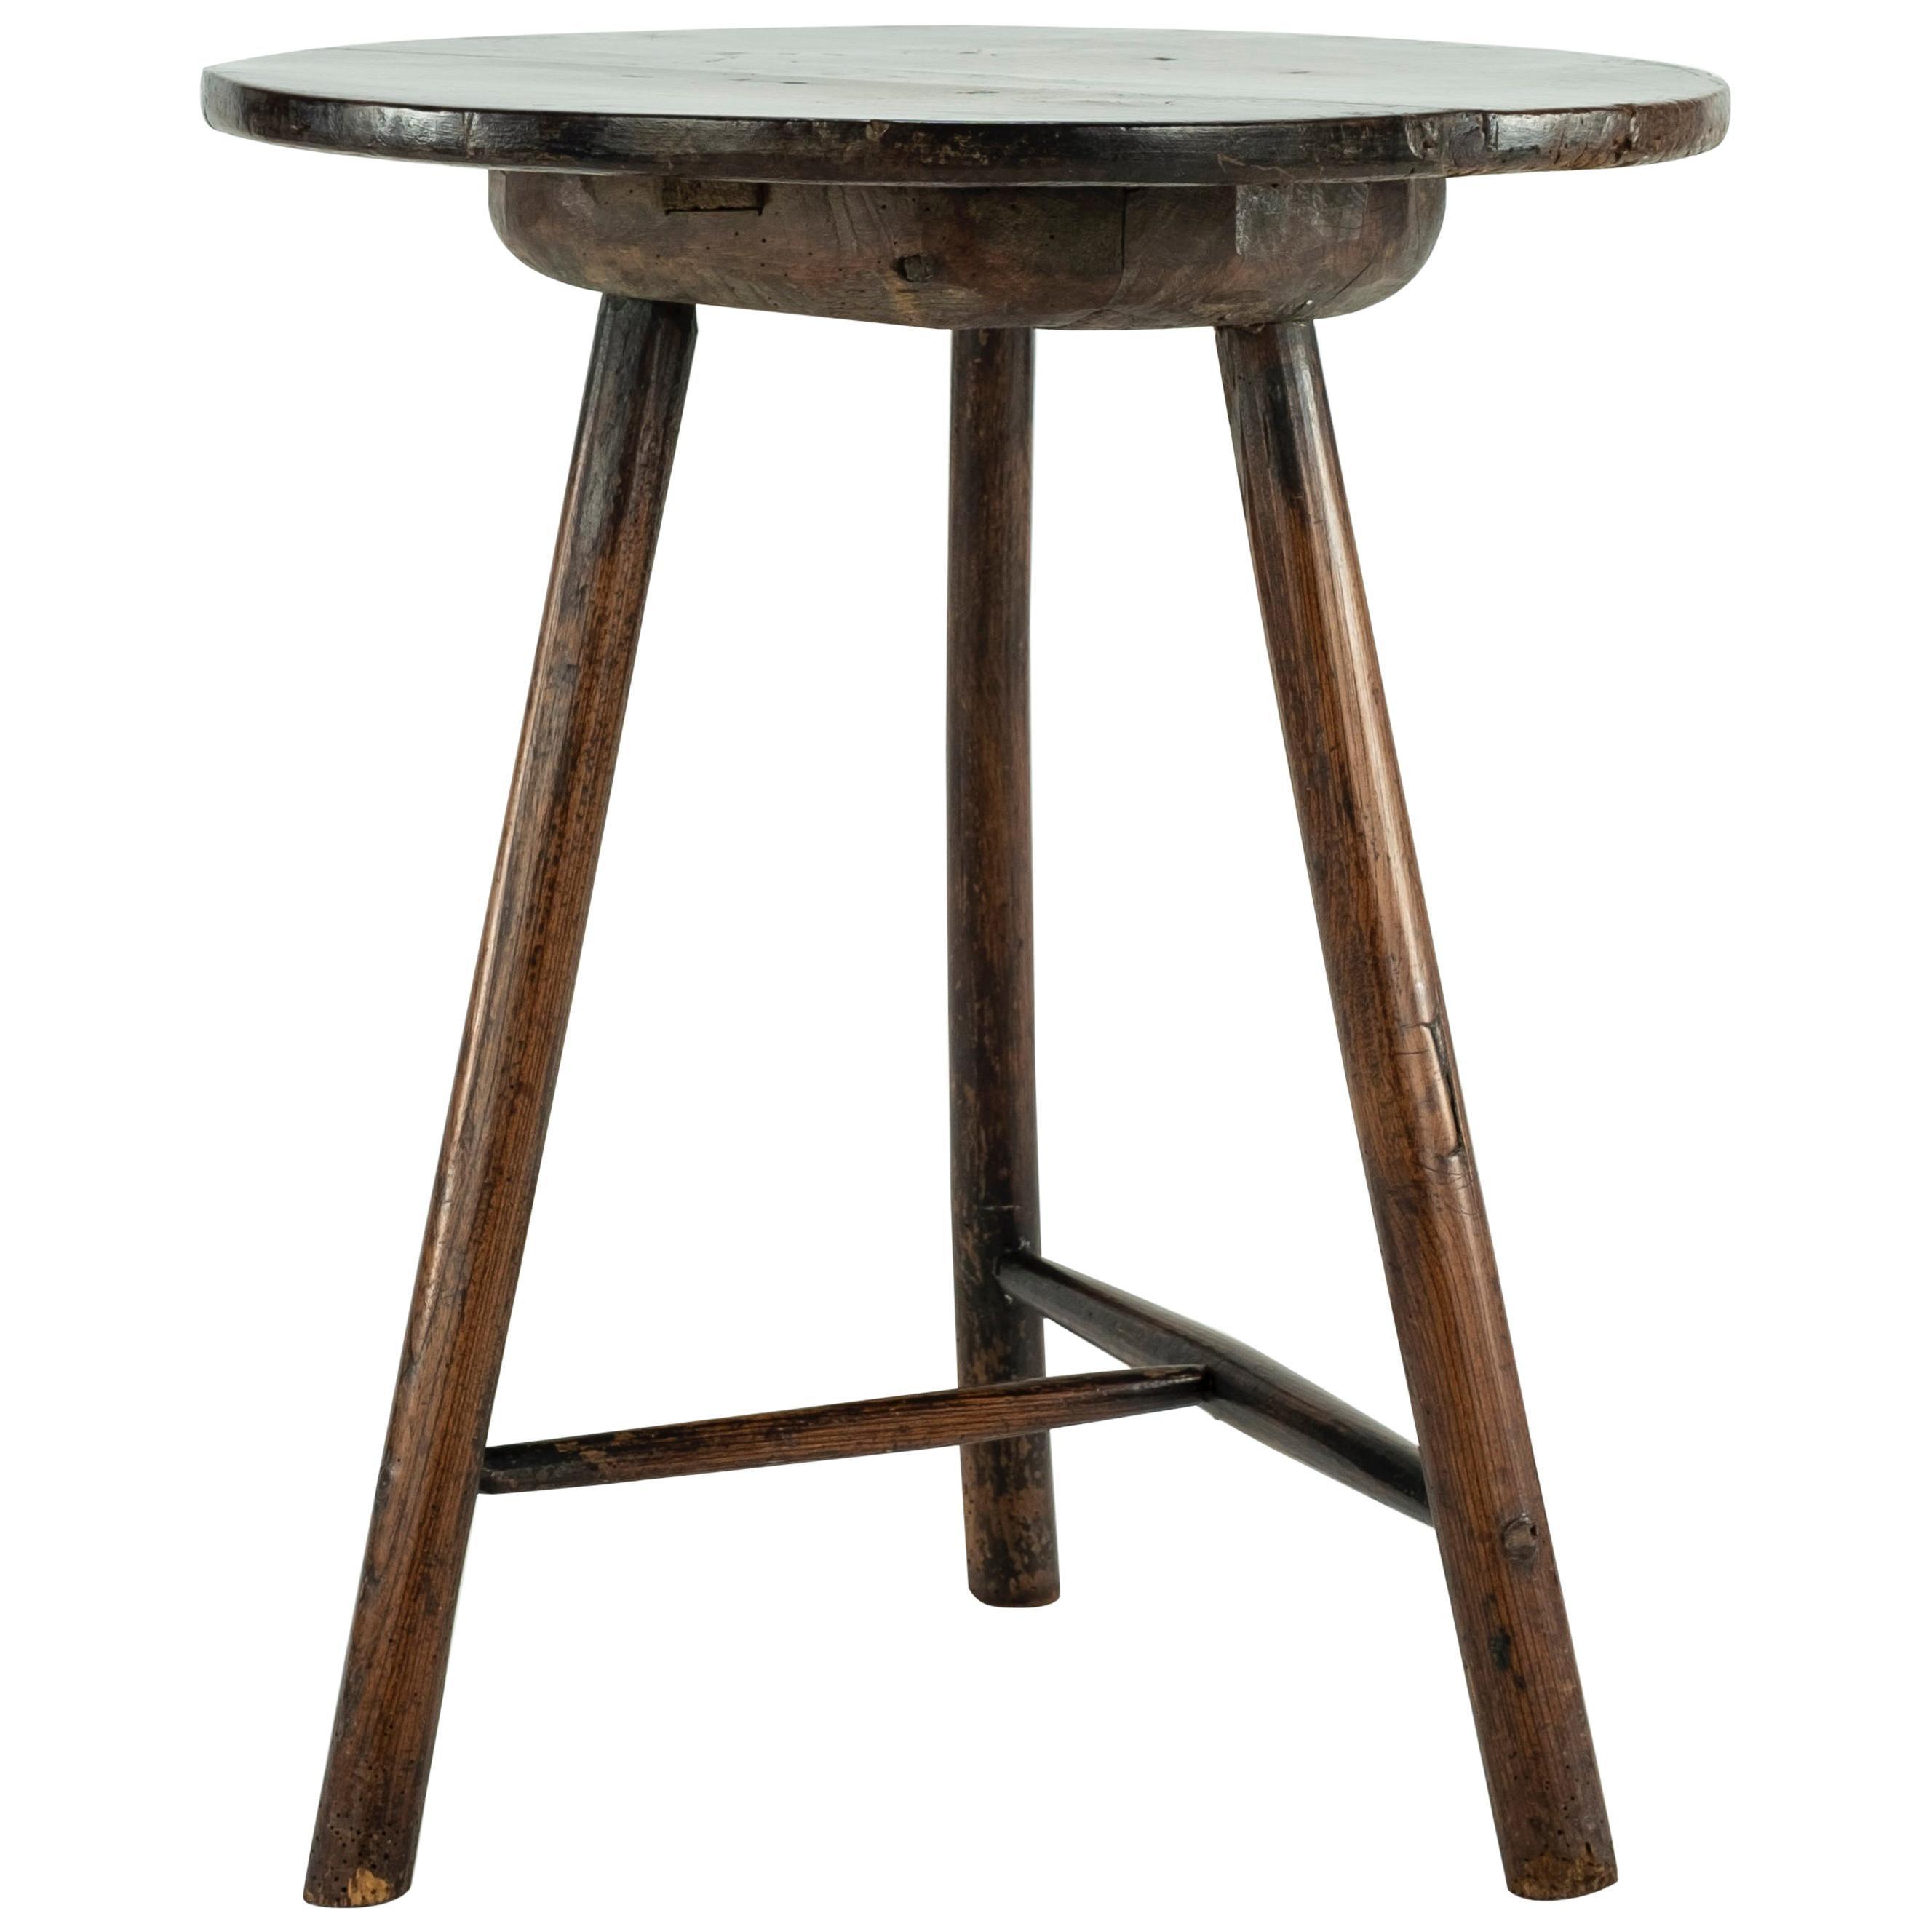 19th Century Rustic Elm Cricket Table